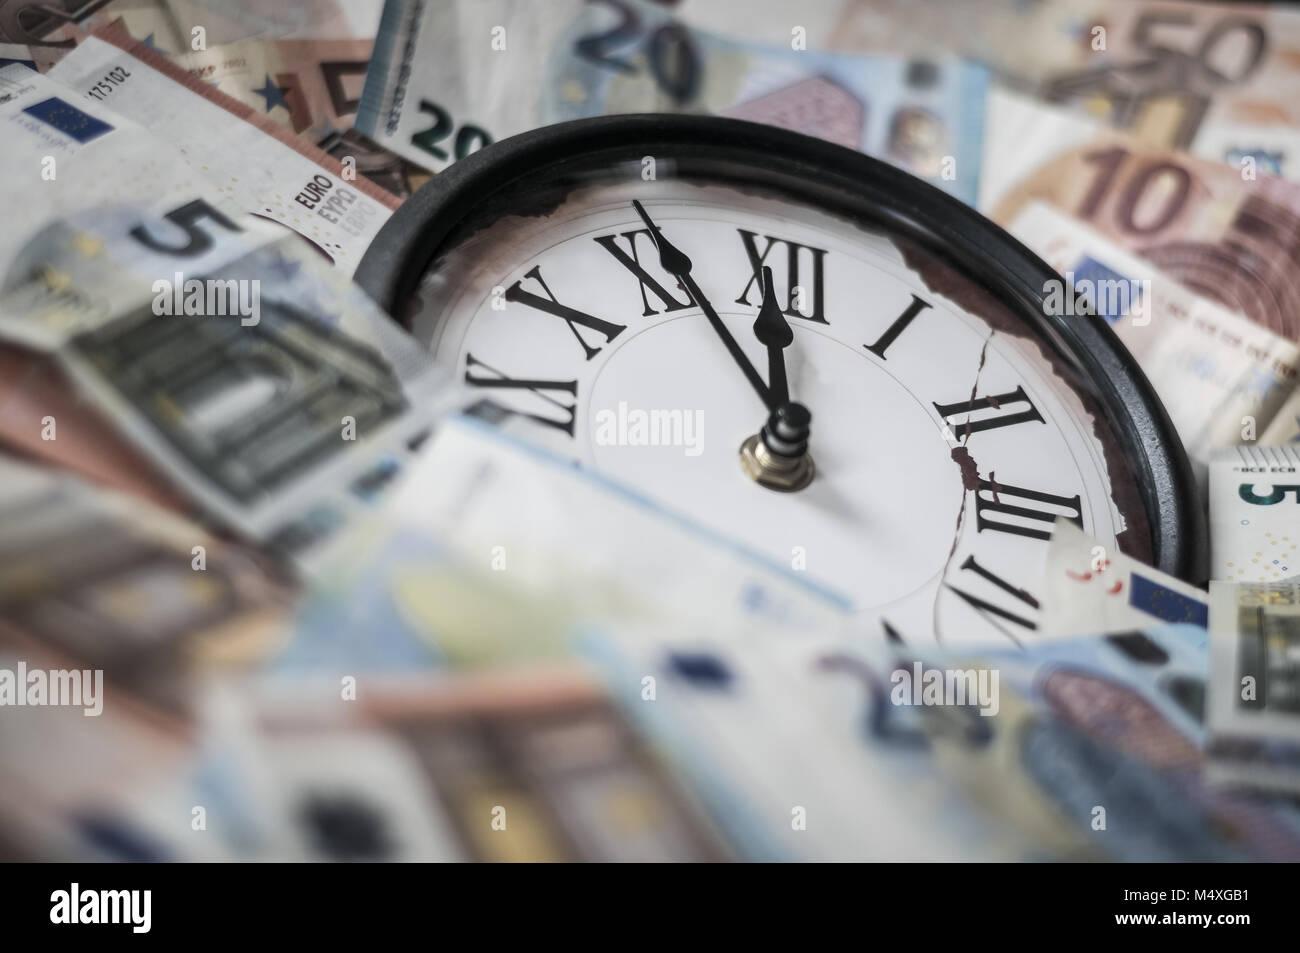 Five minutes before twelve o'clock - Stock Image